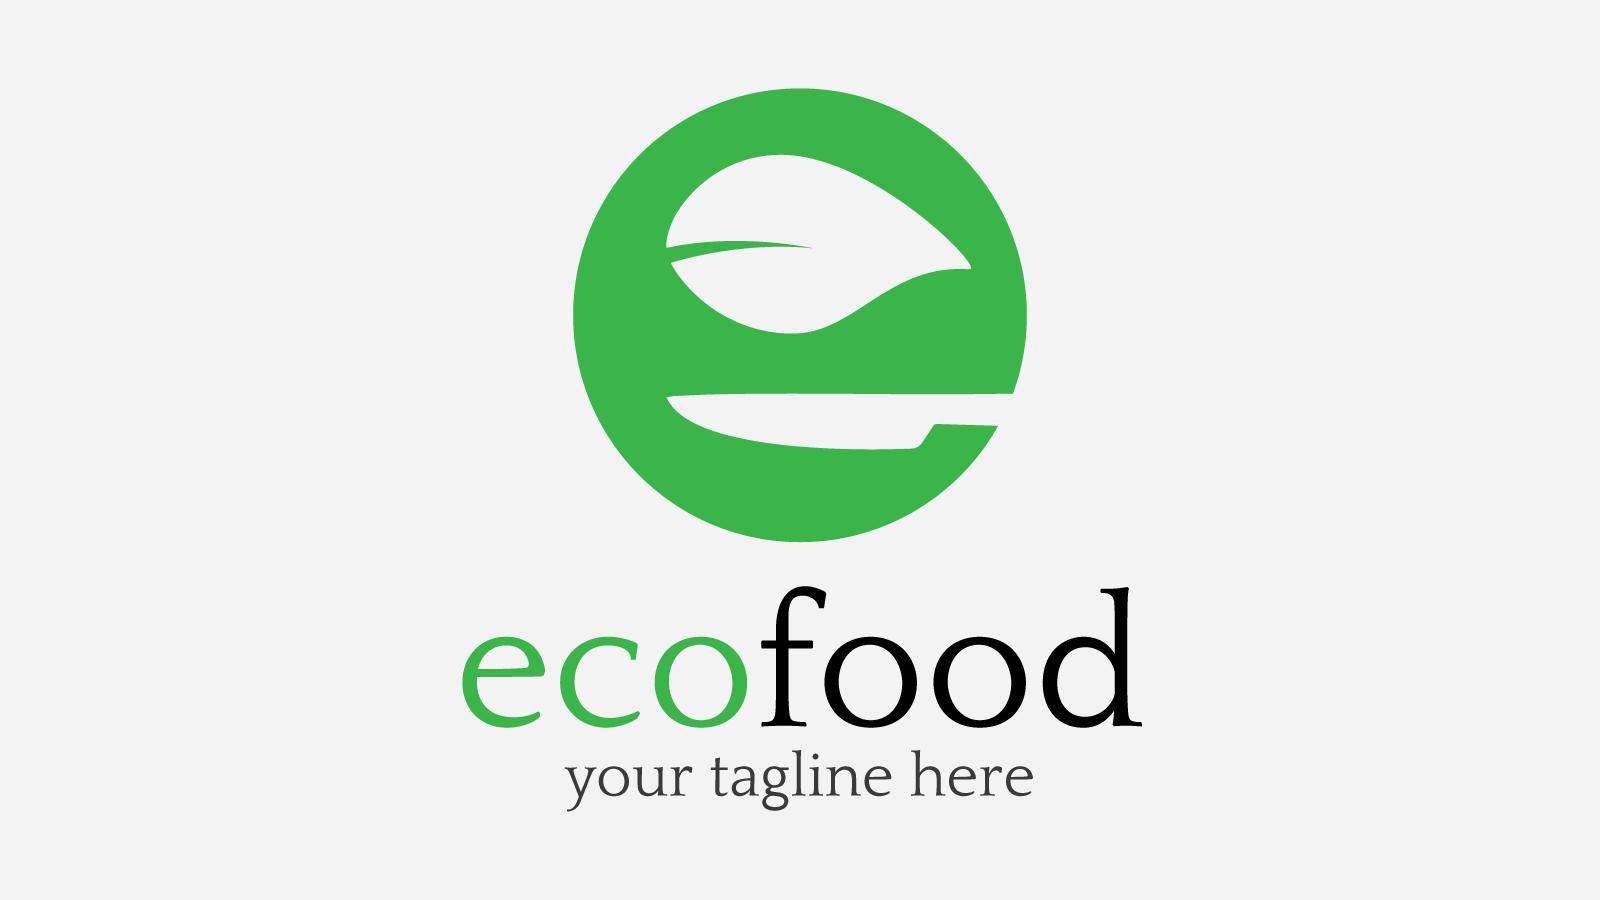 free logo templates - ecofood free logo design zfreegraphic free vector logo